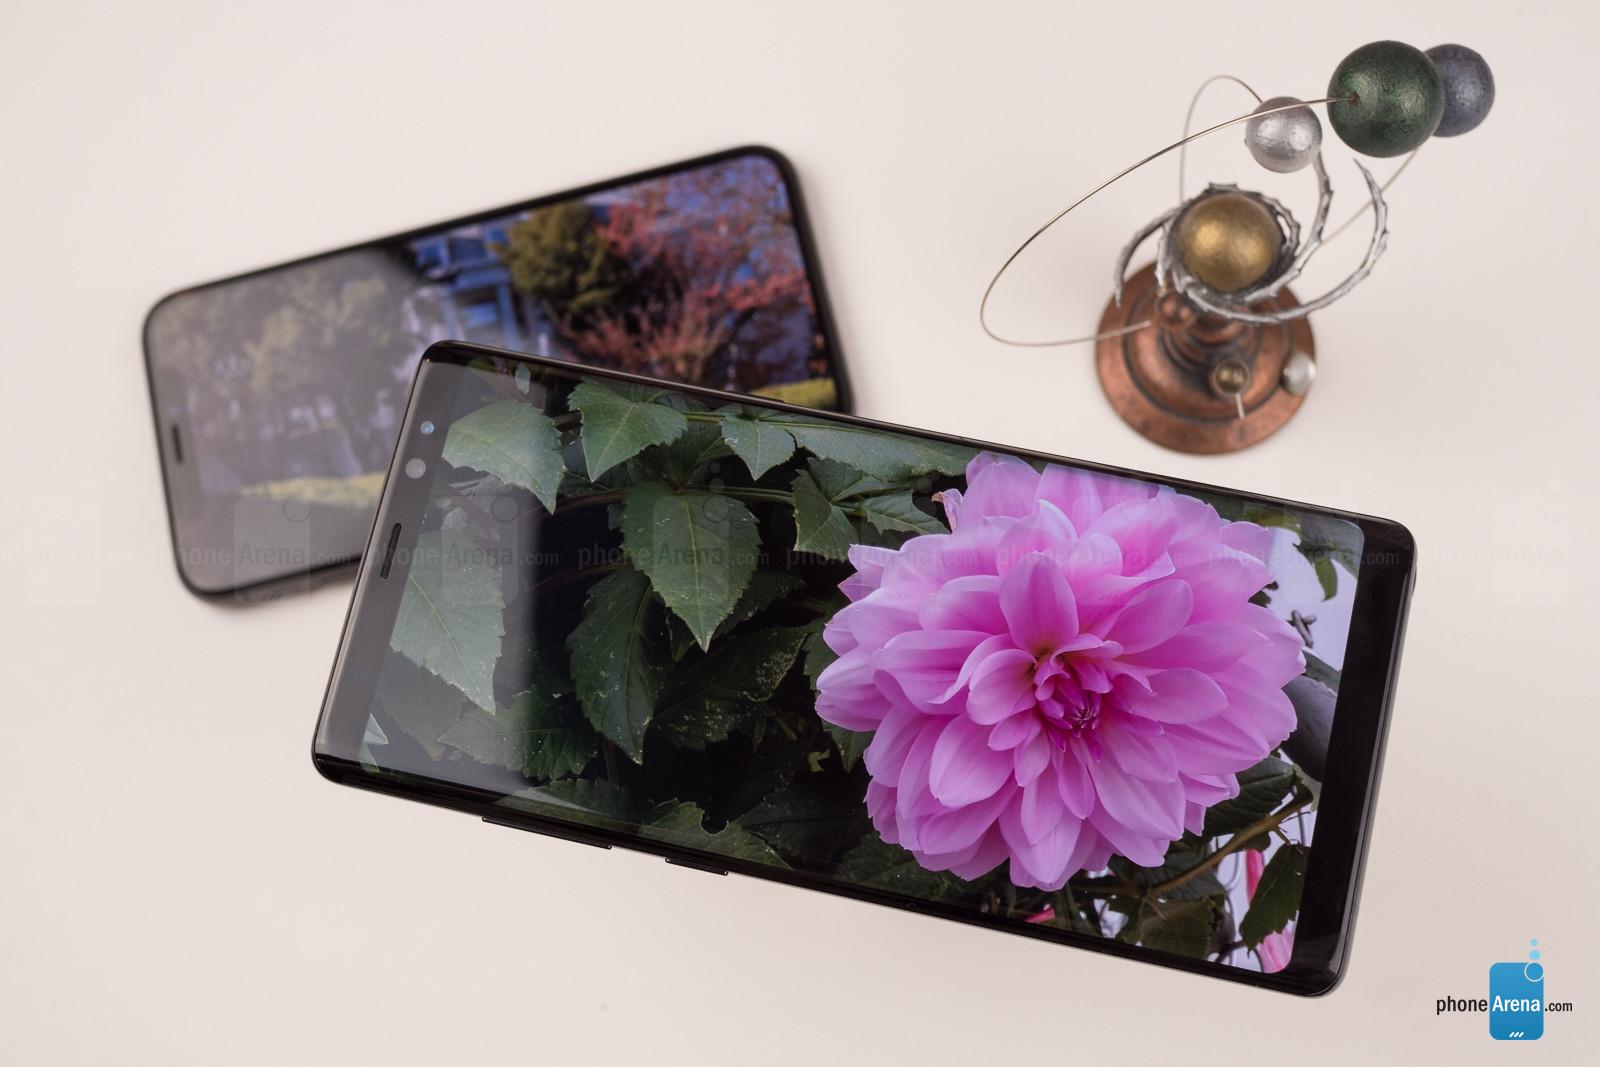 https://i-cdn.phonearena.com/images/reviews/212423-image/Apple-iPhone-X-vs-Samsung-Galaxy-Note-8-014.jpg